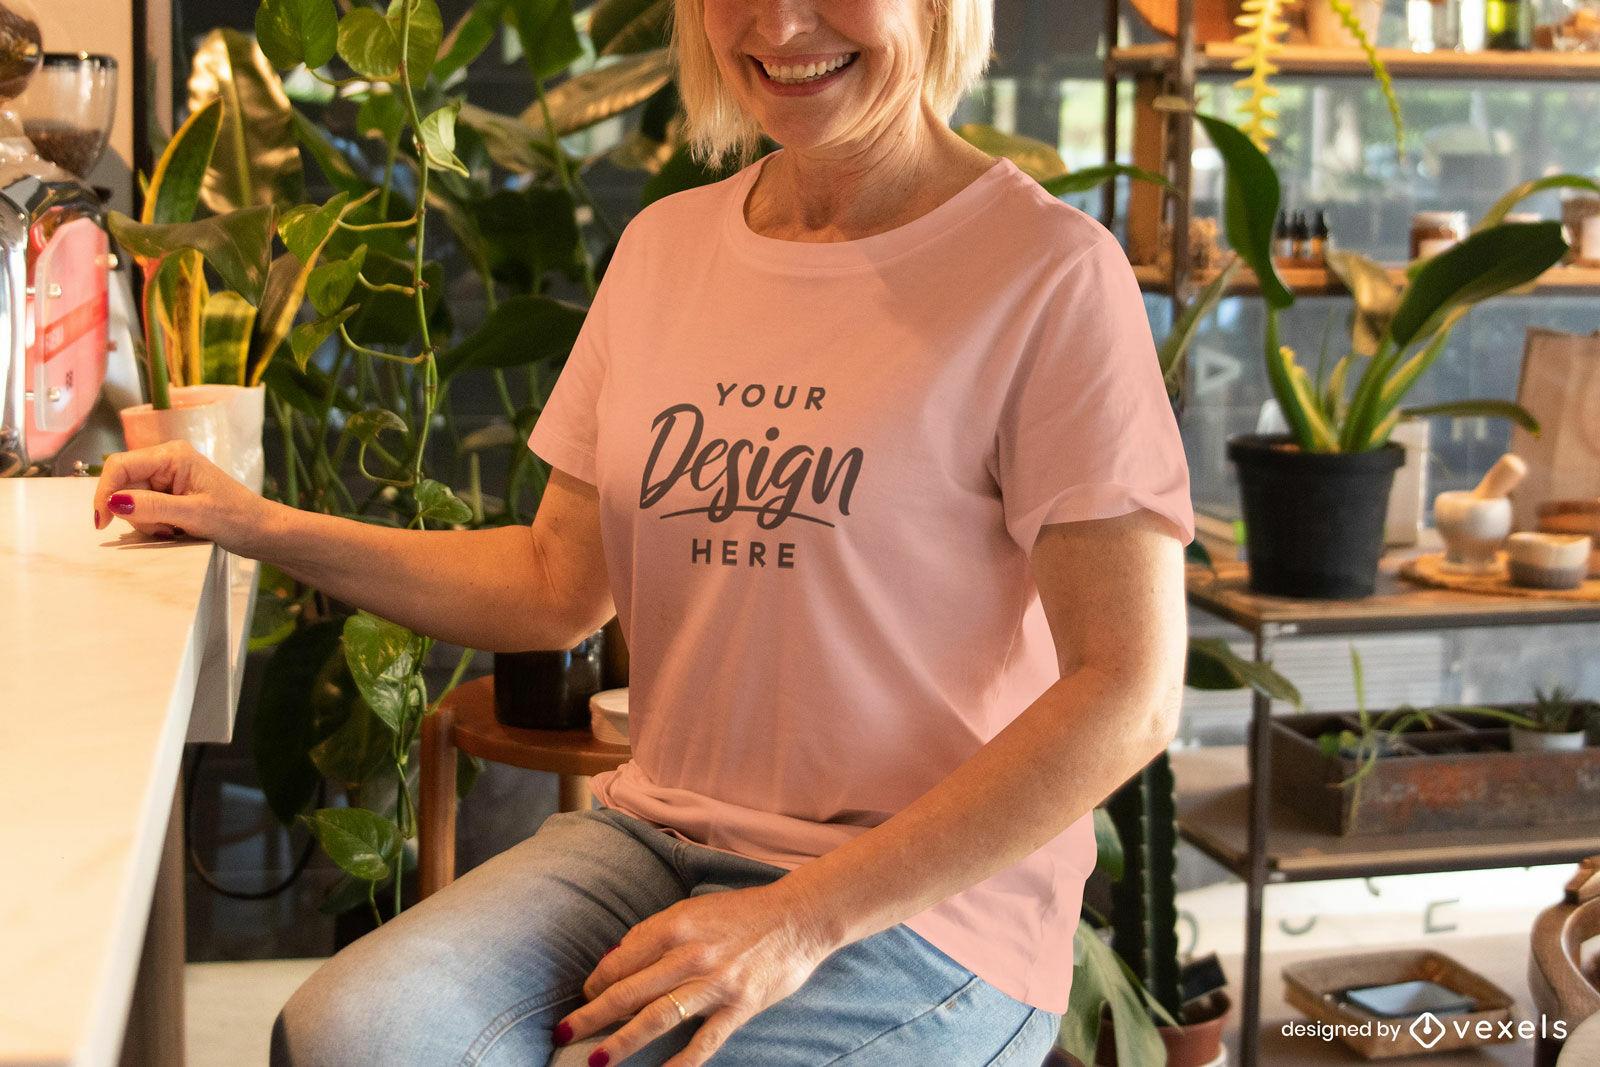 Frauenmodell mit rosa T-Shirt sitzend